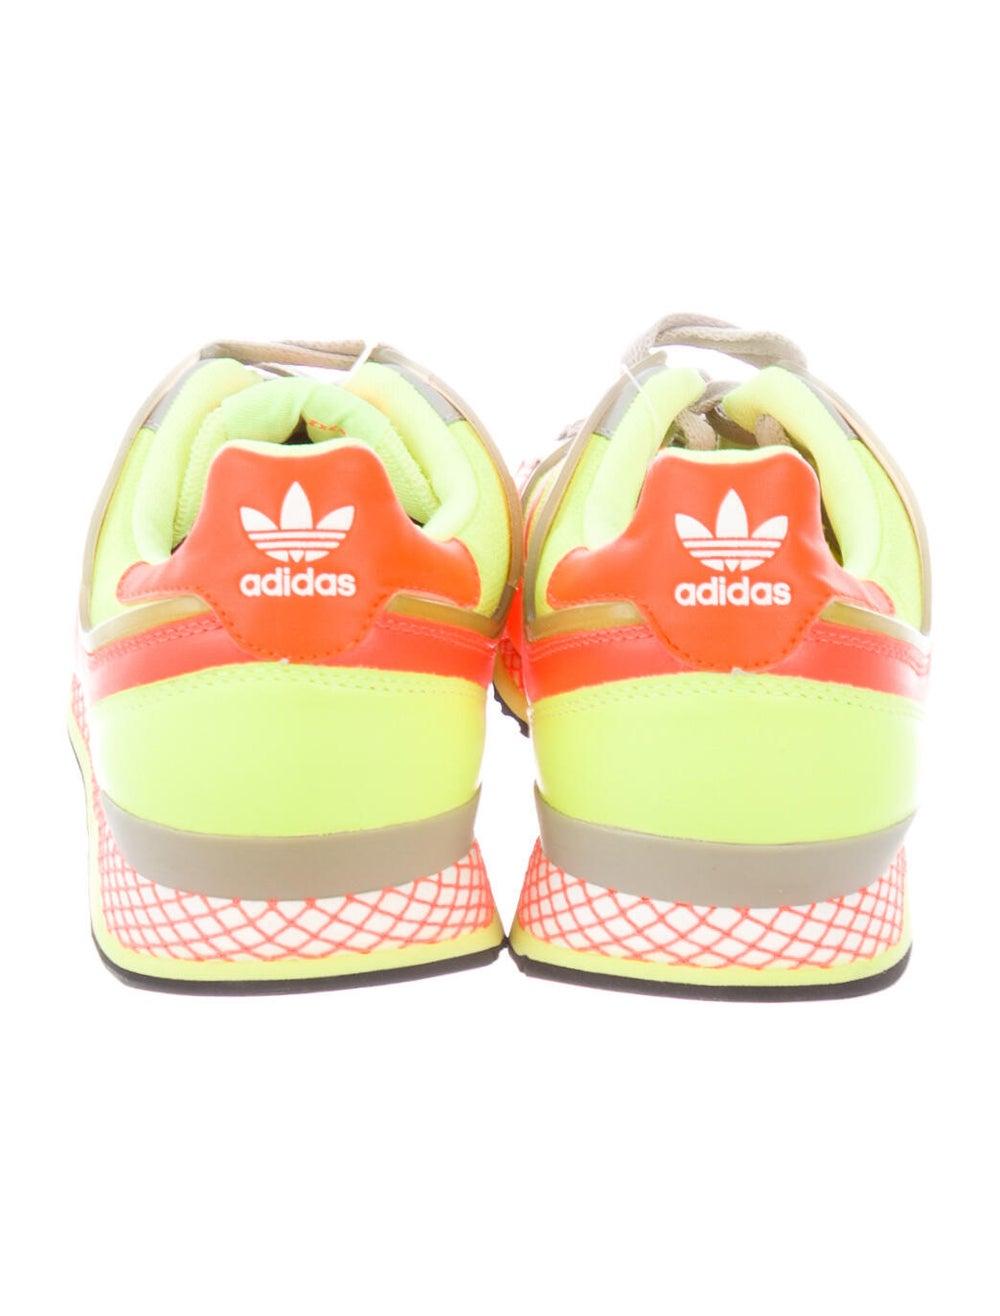 Adidas Leather Printed Athletic Sneakers Orange - image 4